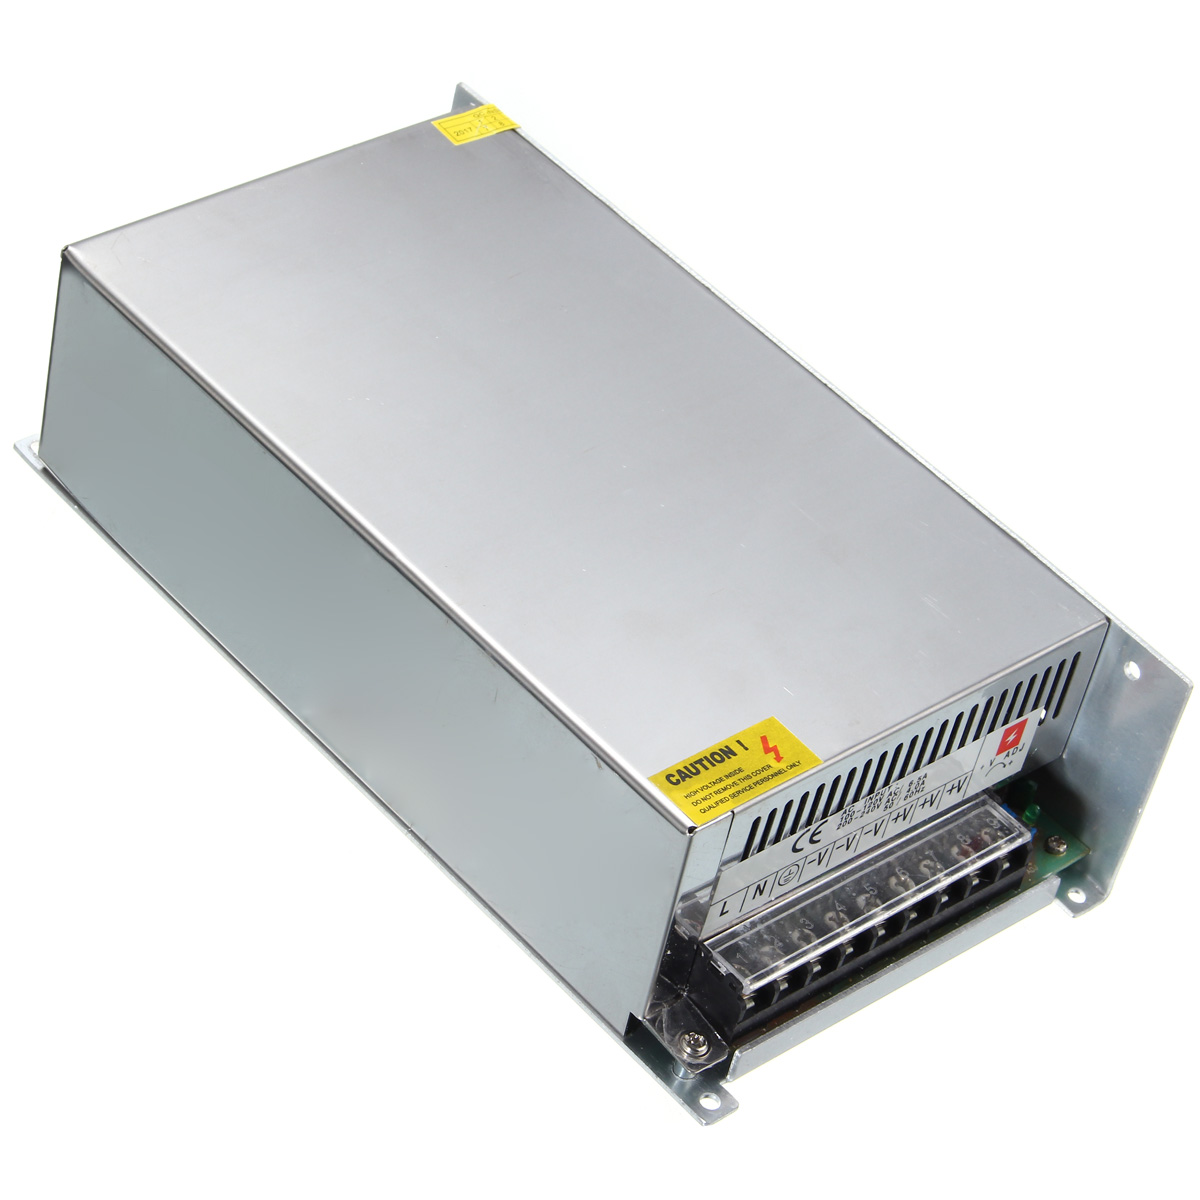 Smuxi Universal AC110V/AC220V To DC 48V 20A 1000W Switch Power Supply Driver Transformer Adapter